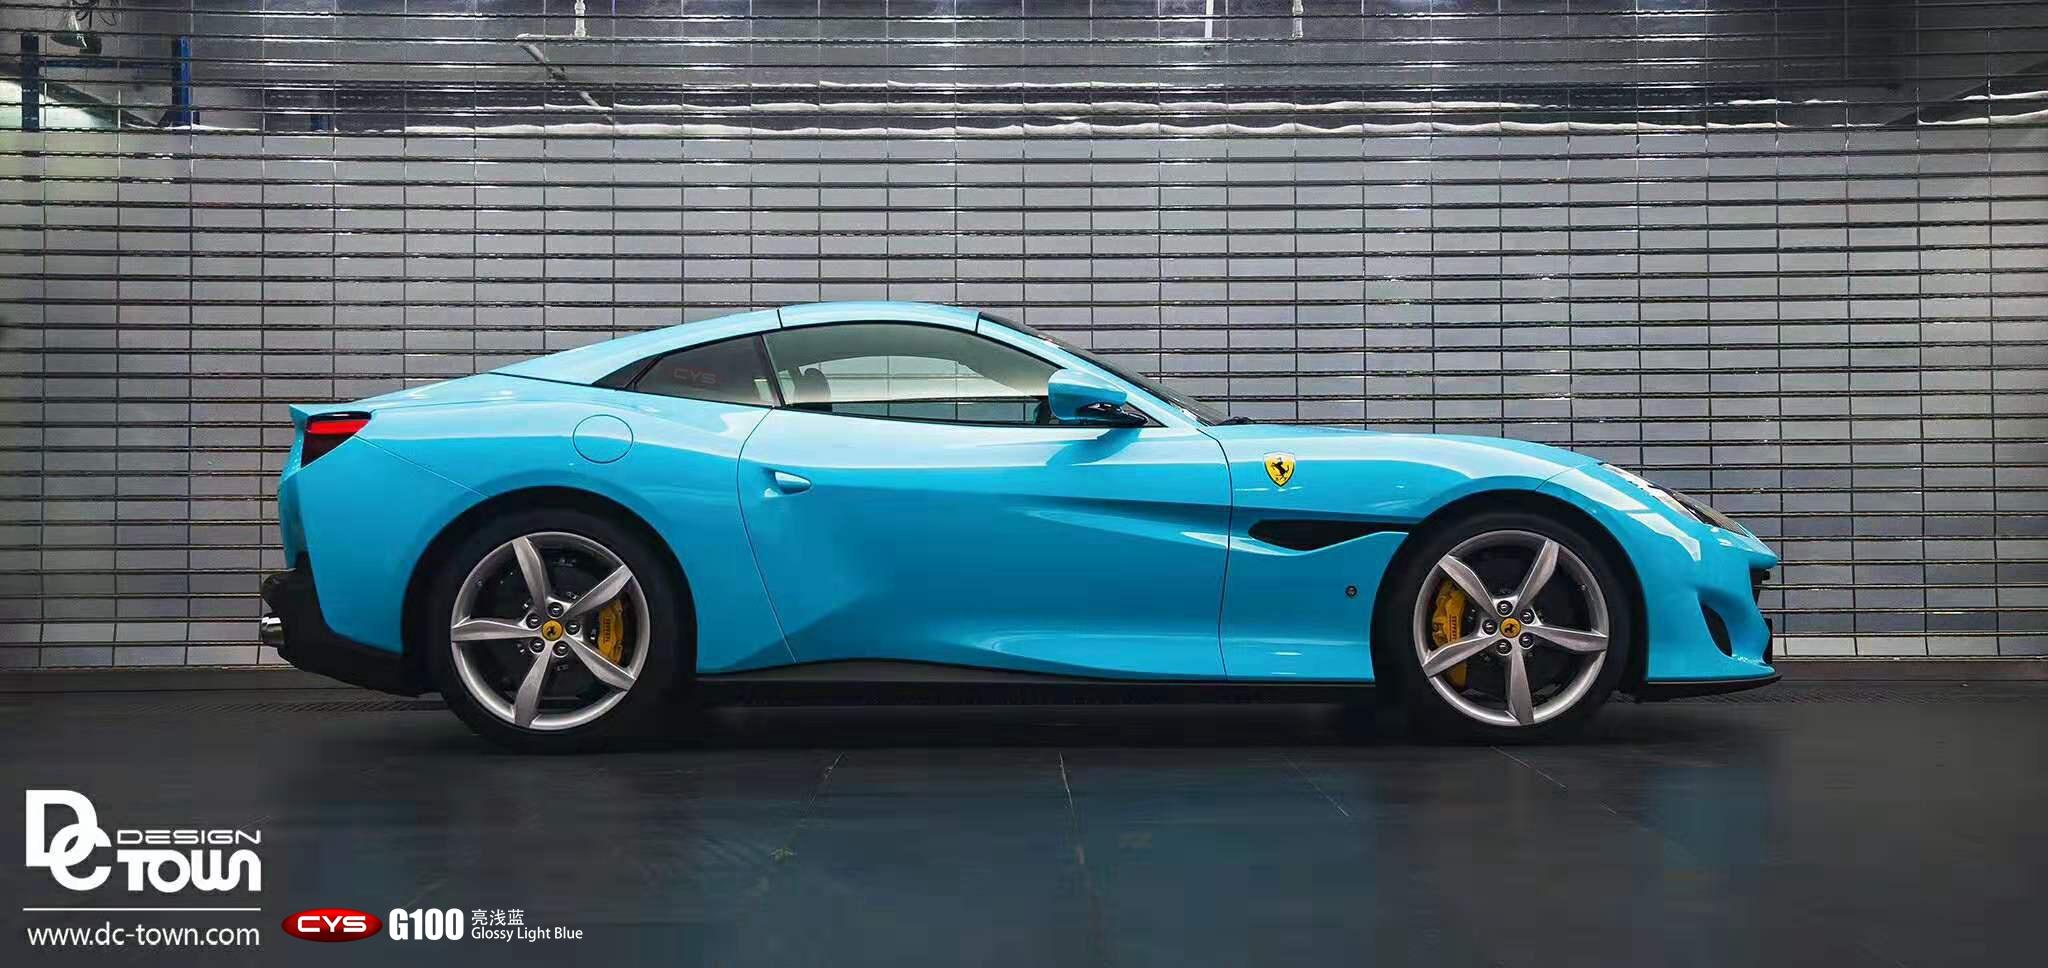 Ferrari Portofino G100 Glossy Light Blue Gallery Cys Vehicle Film Official Website Powered By Cheyishang Com